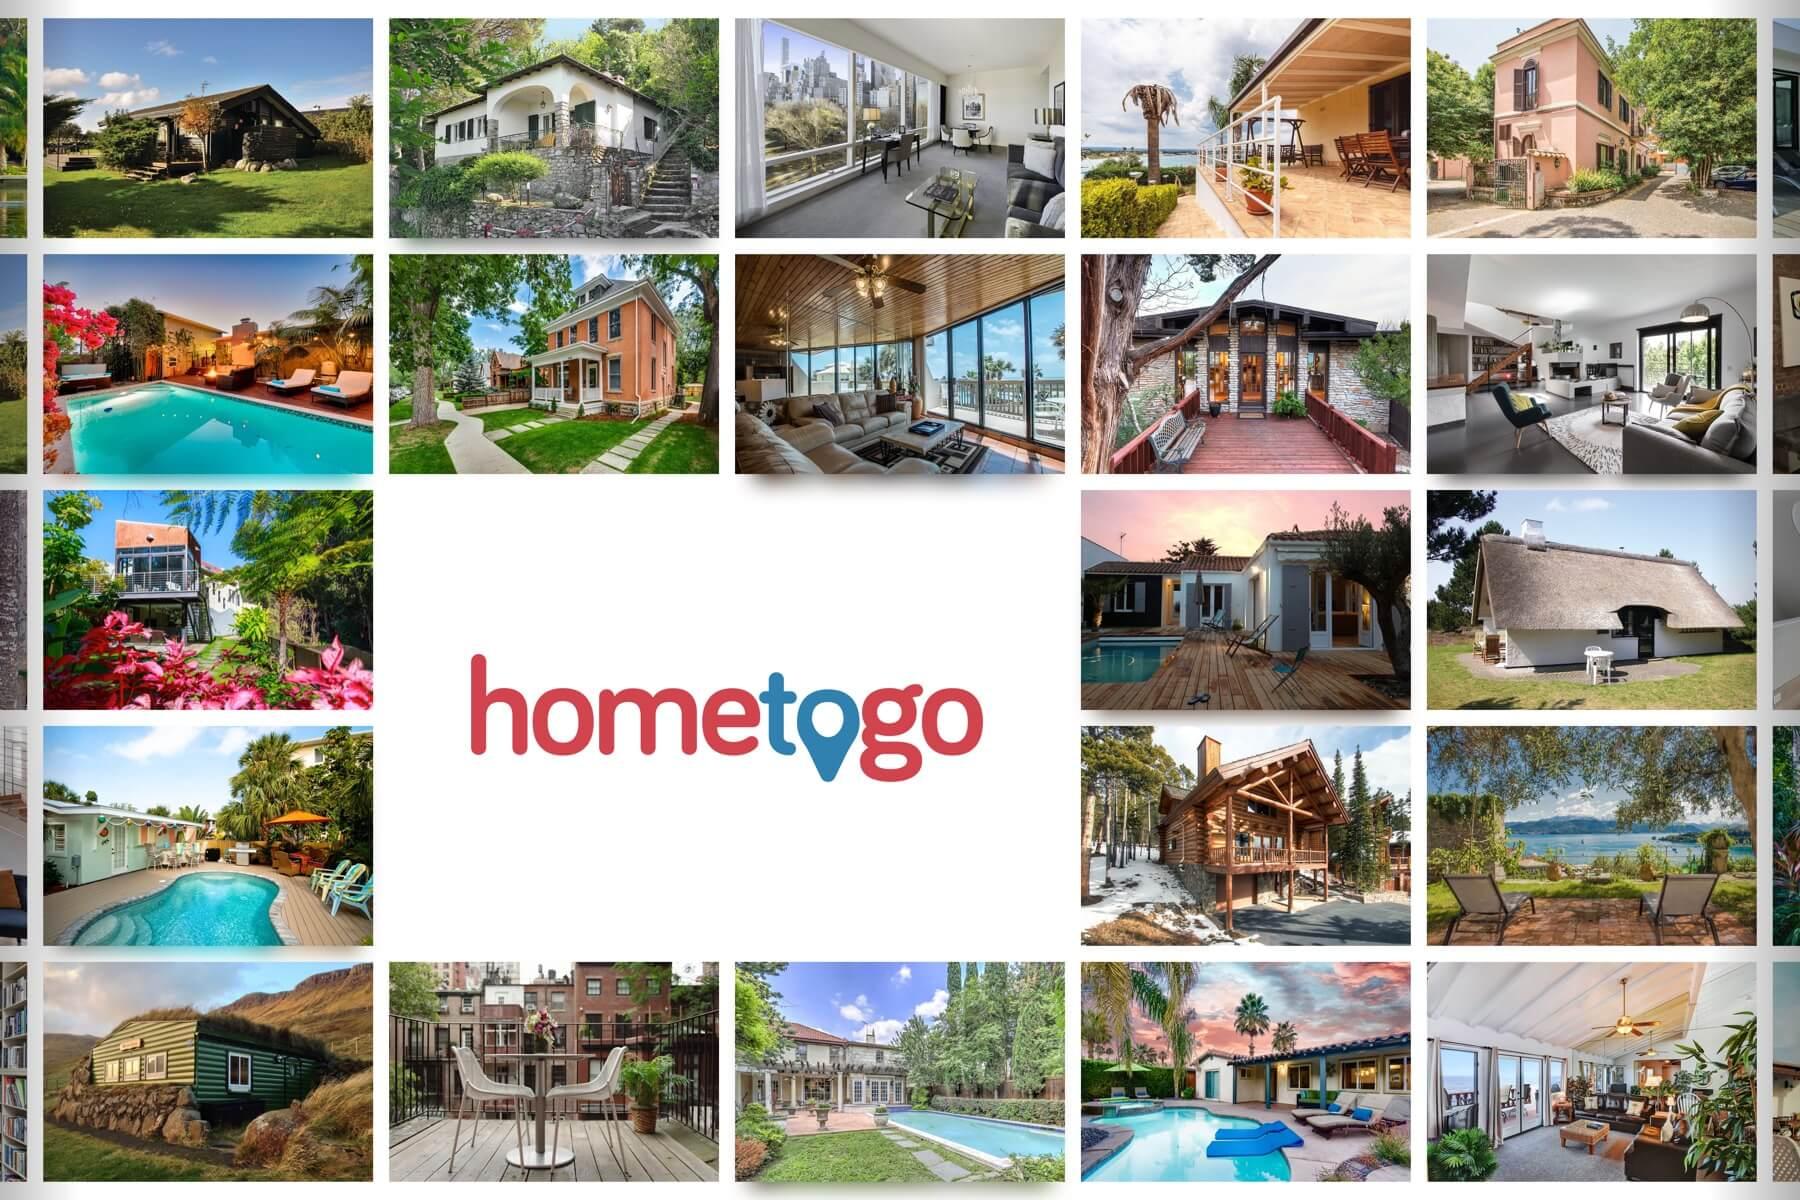 hometogo-main-myrent